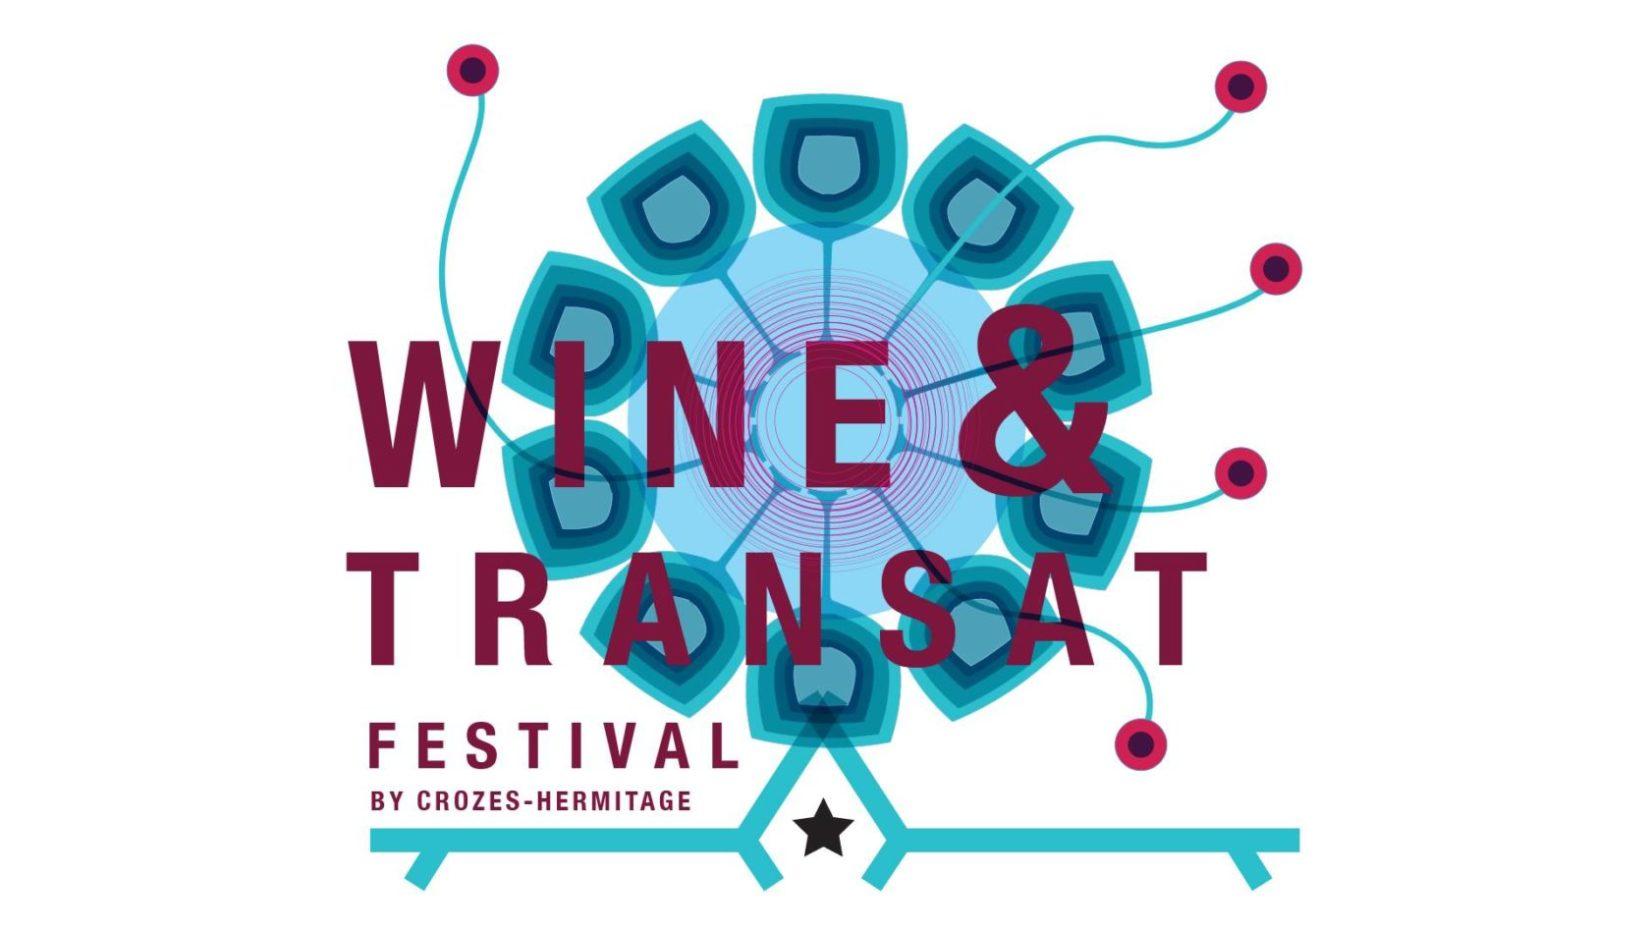 Wine & Transat Festival by Crozes-Hermitage